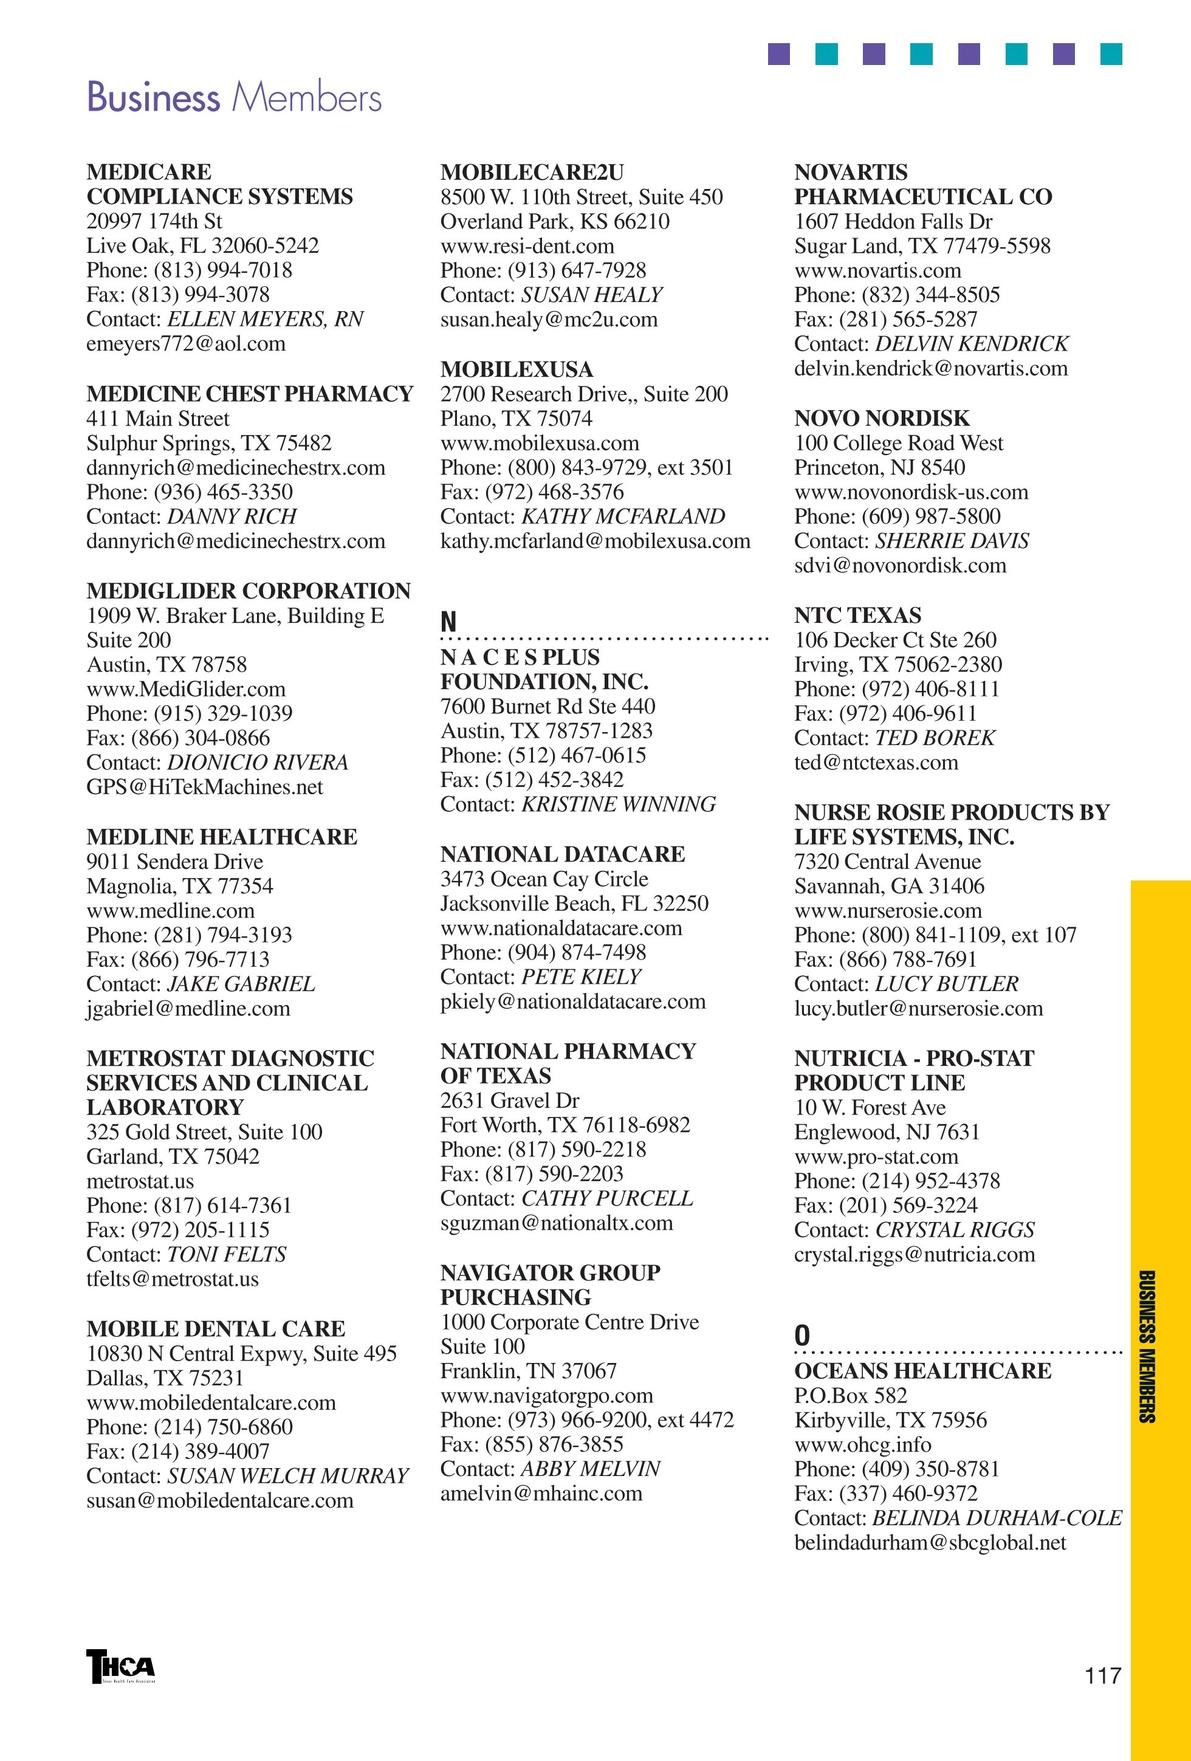 Texas Health Care Association - 2012/2013 Membership Directory